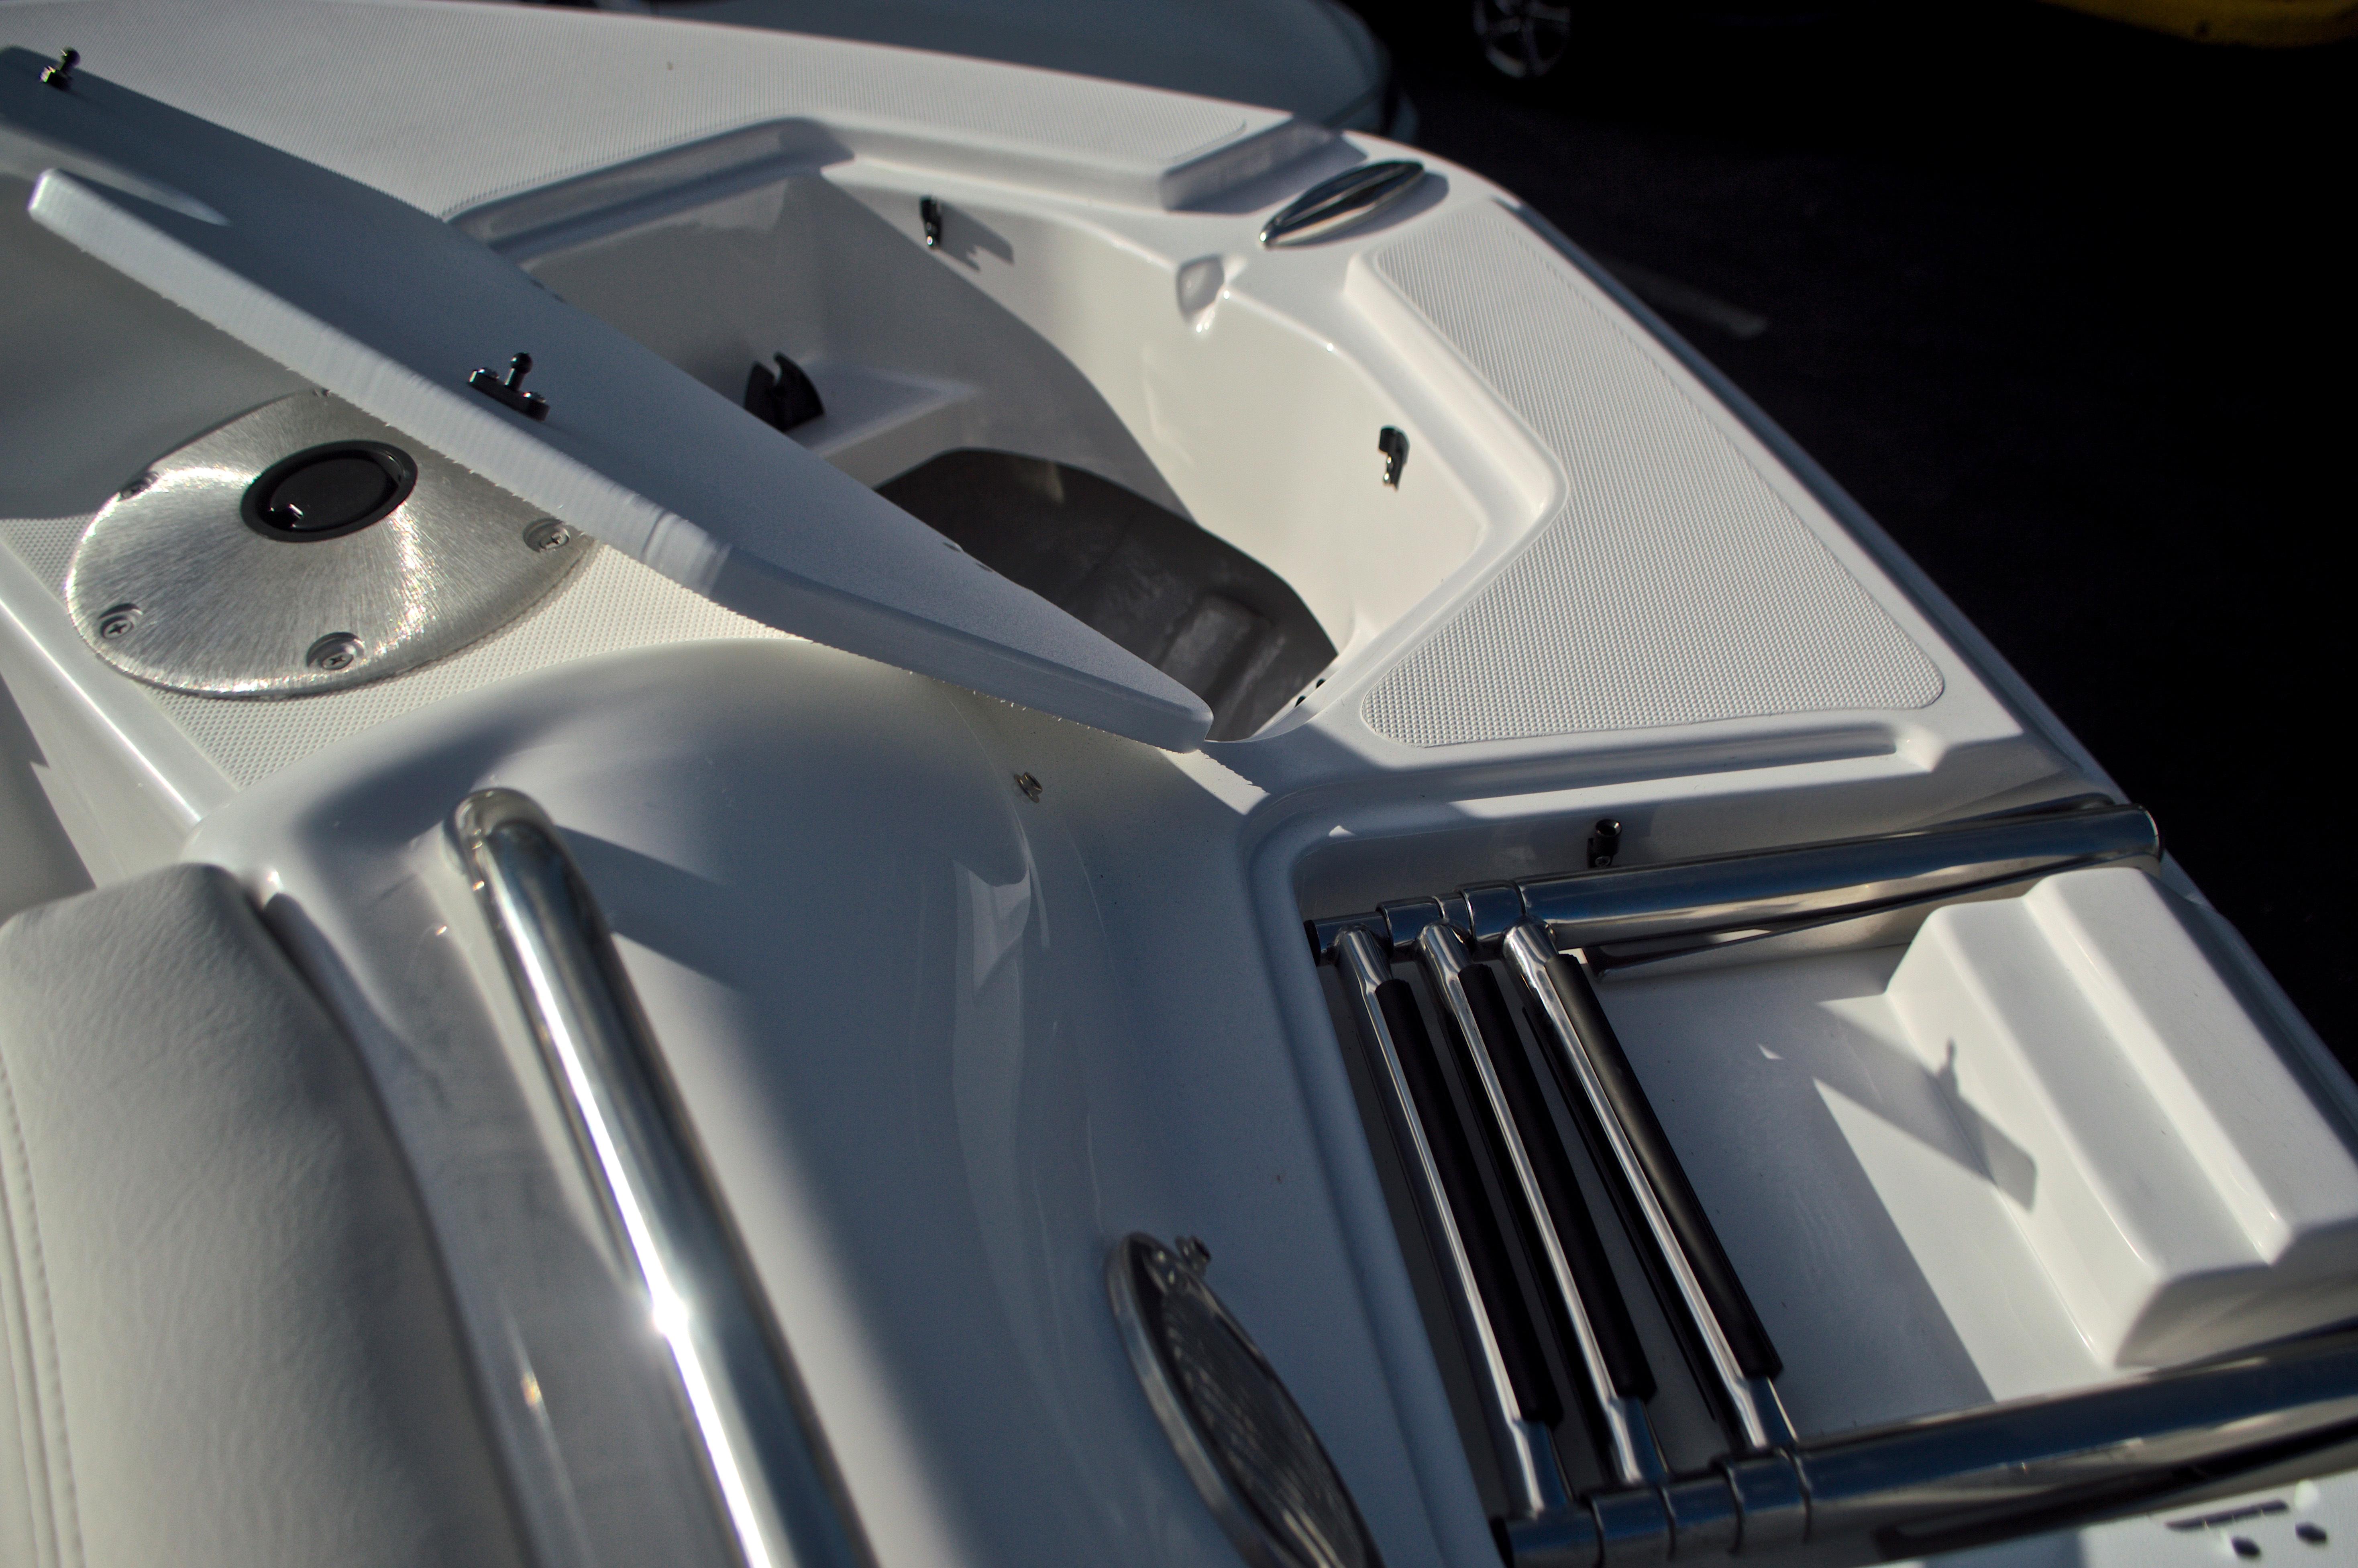 Thumbnail 65 for New 2017 Hurricane SunDeck SD 2400 OB boat for sale in Miami, FL